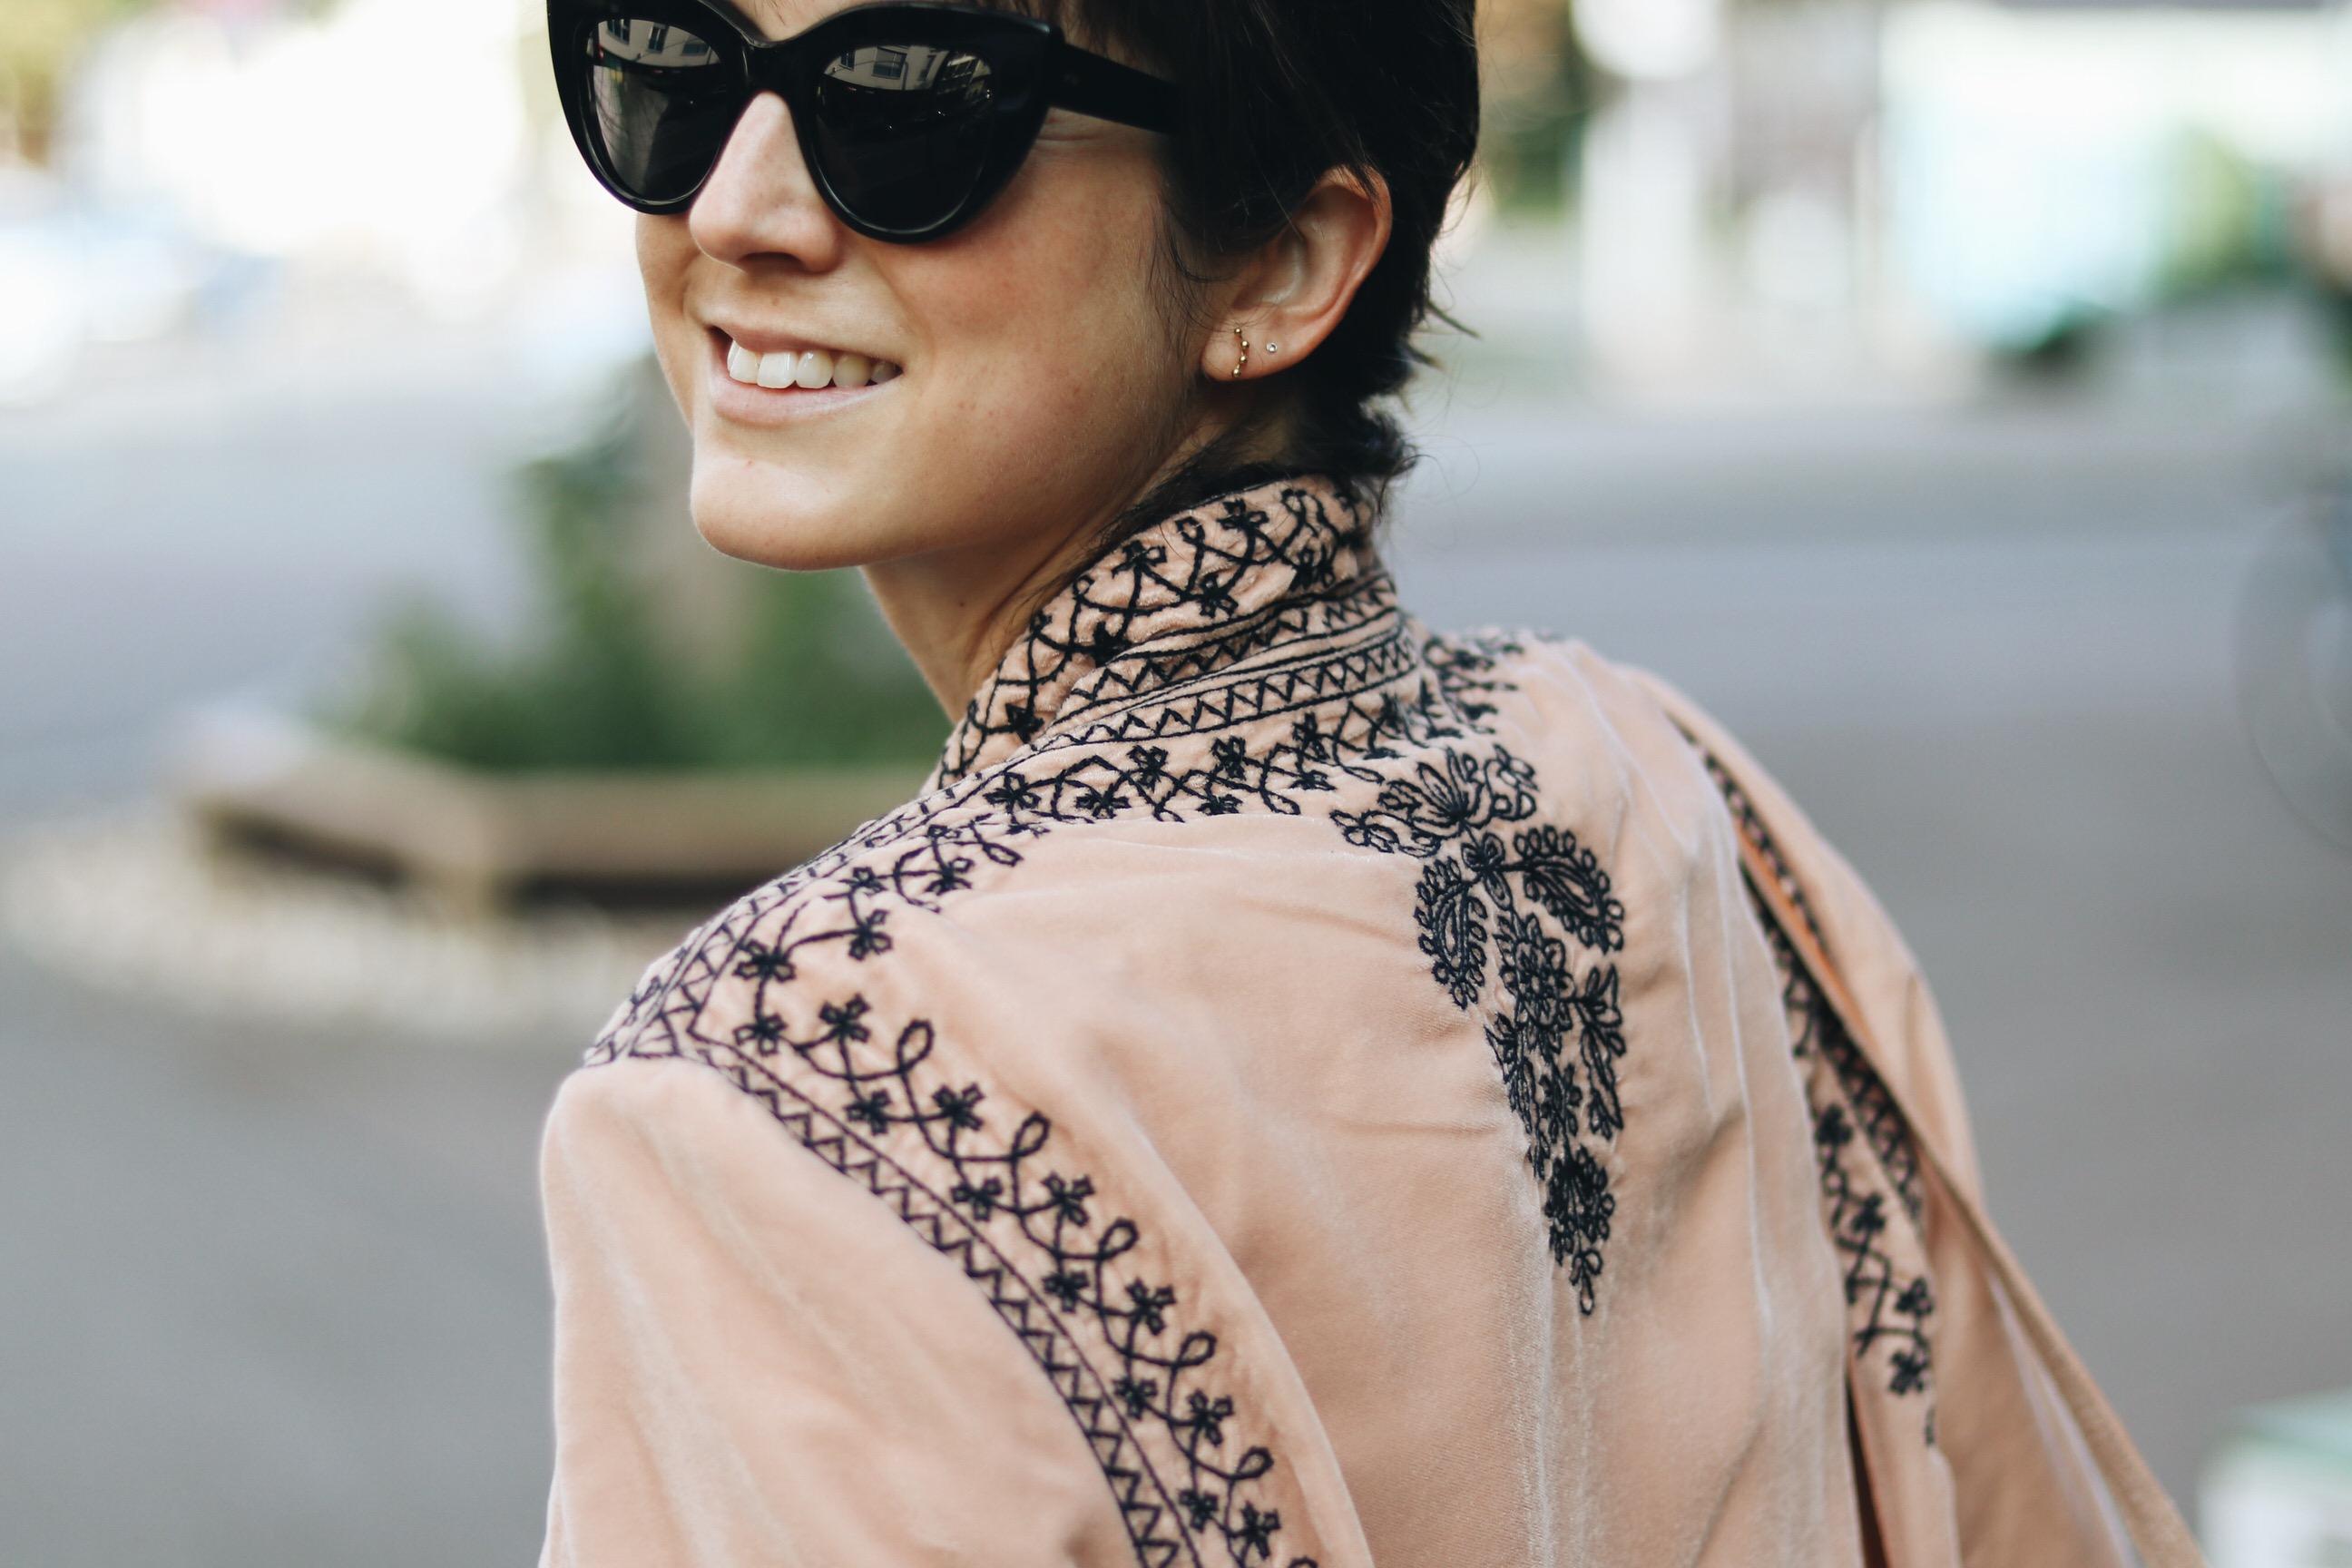 samt-kimono-outfit-kombinieren-herbst-trend